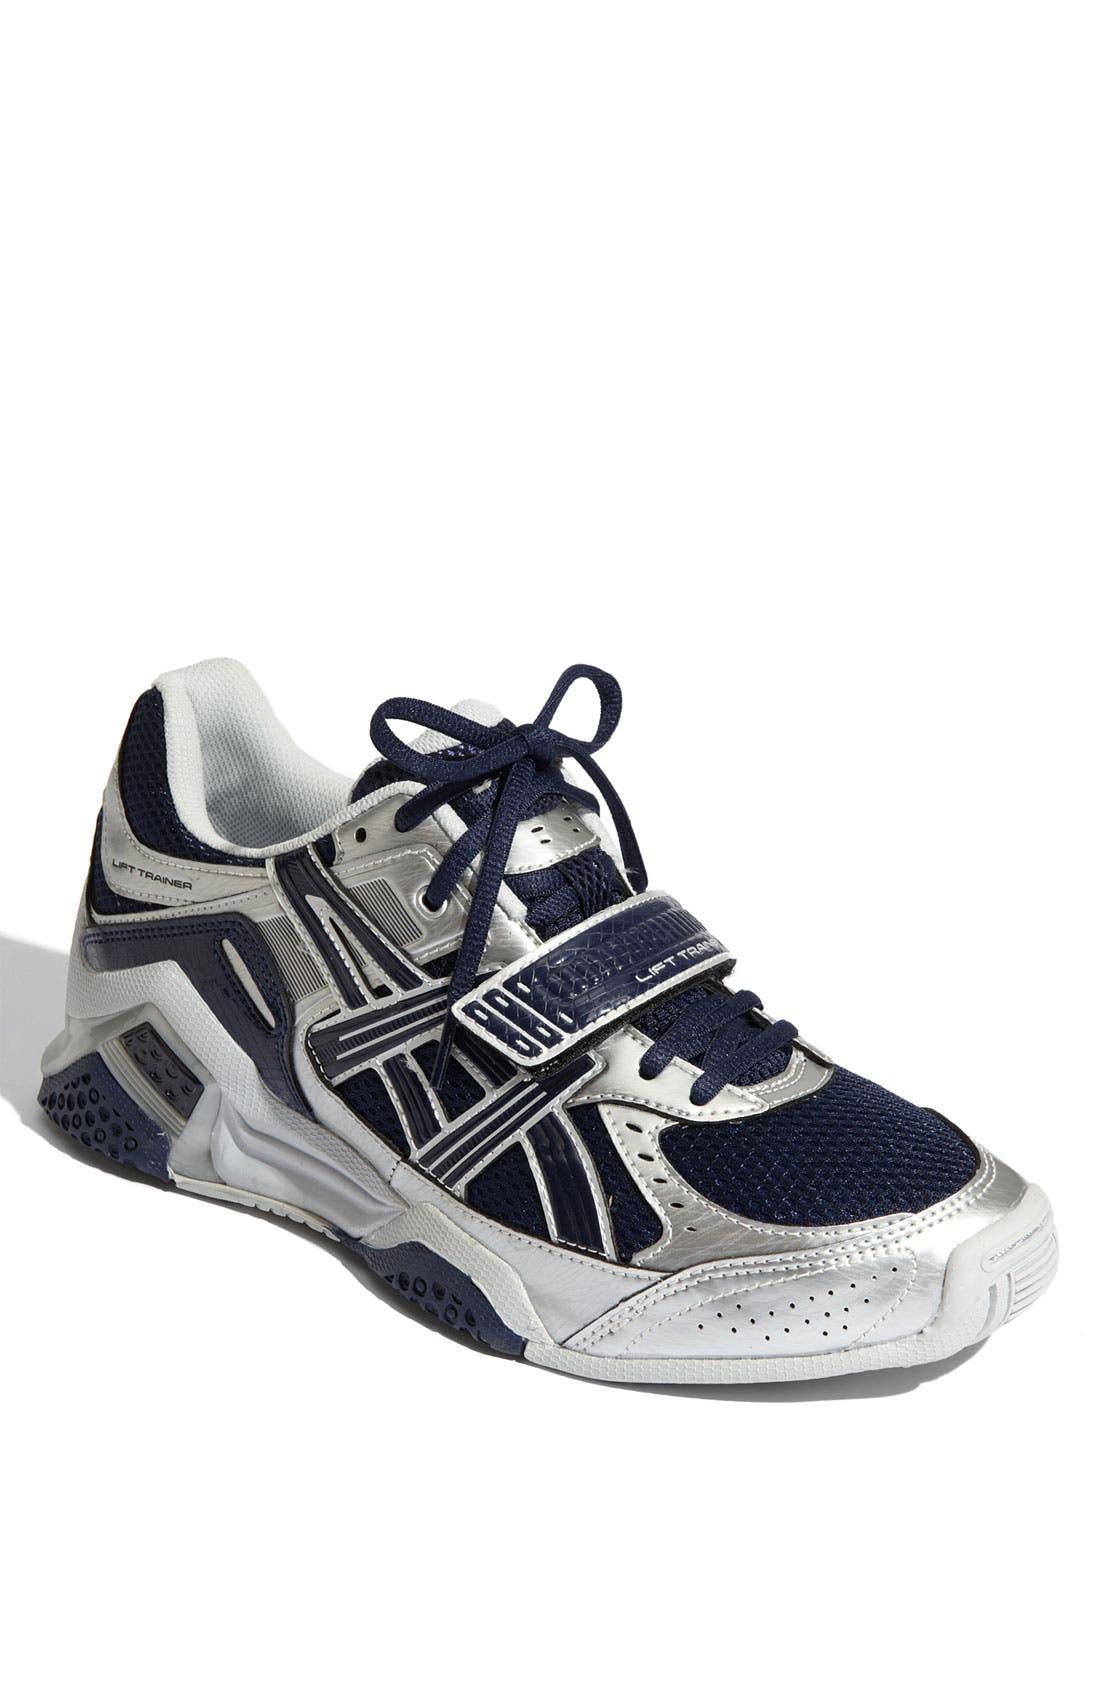 Alternate Image 1 Selected - ASICS® 'Lift Trainer' Training Shoe